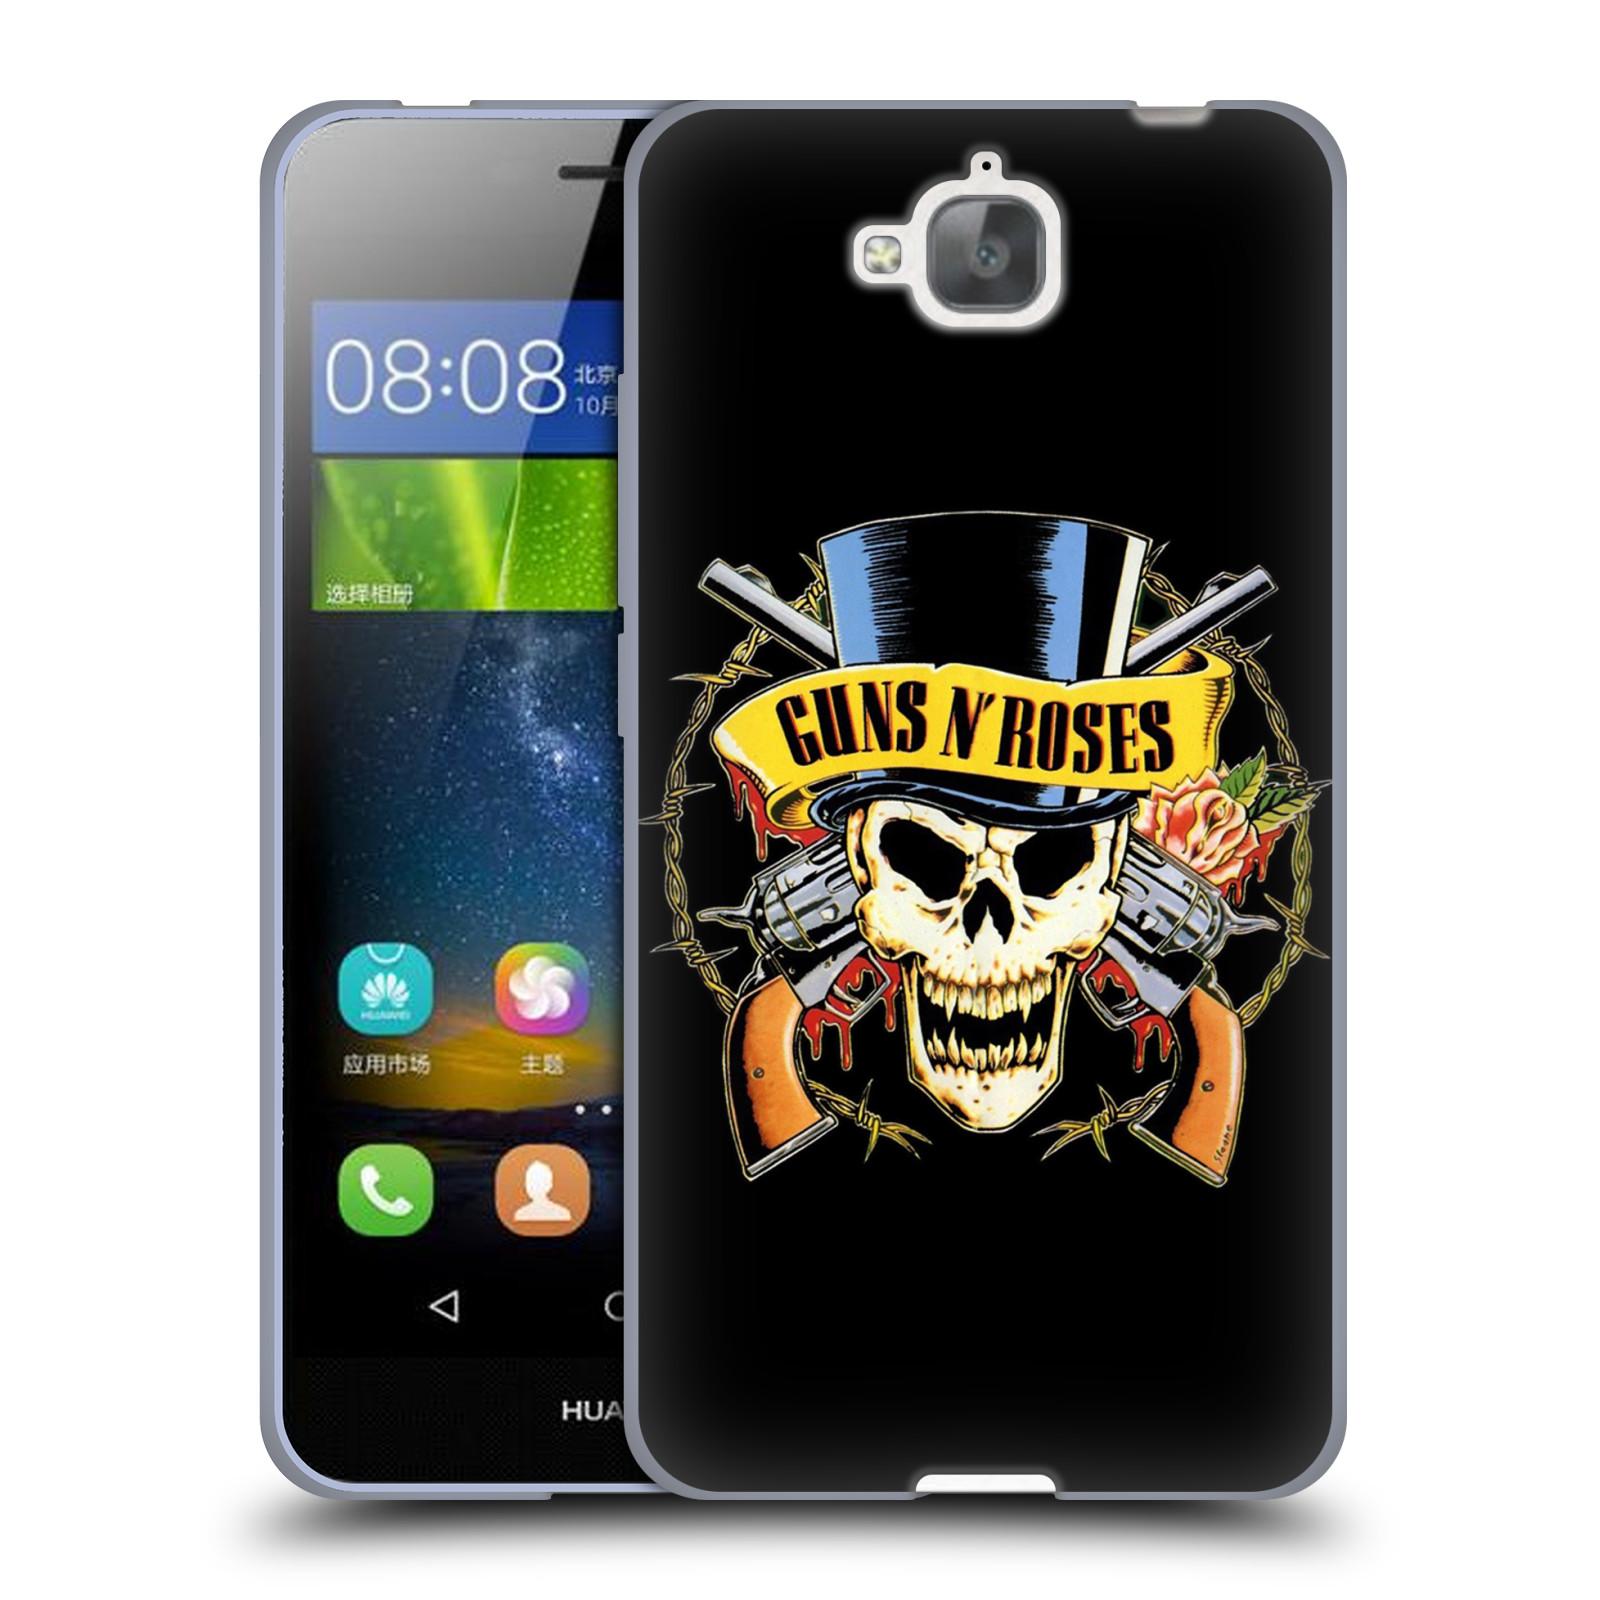 Silikonové pouzdro na mobil Huawei Y6 Pro Dual Sim HEAD CASE Guns N' Roses - Lebka